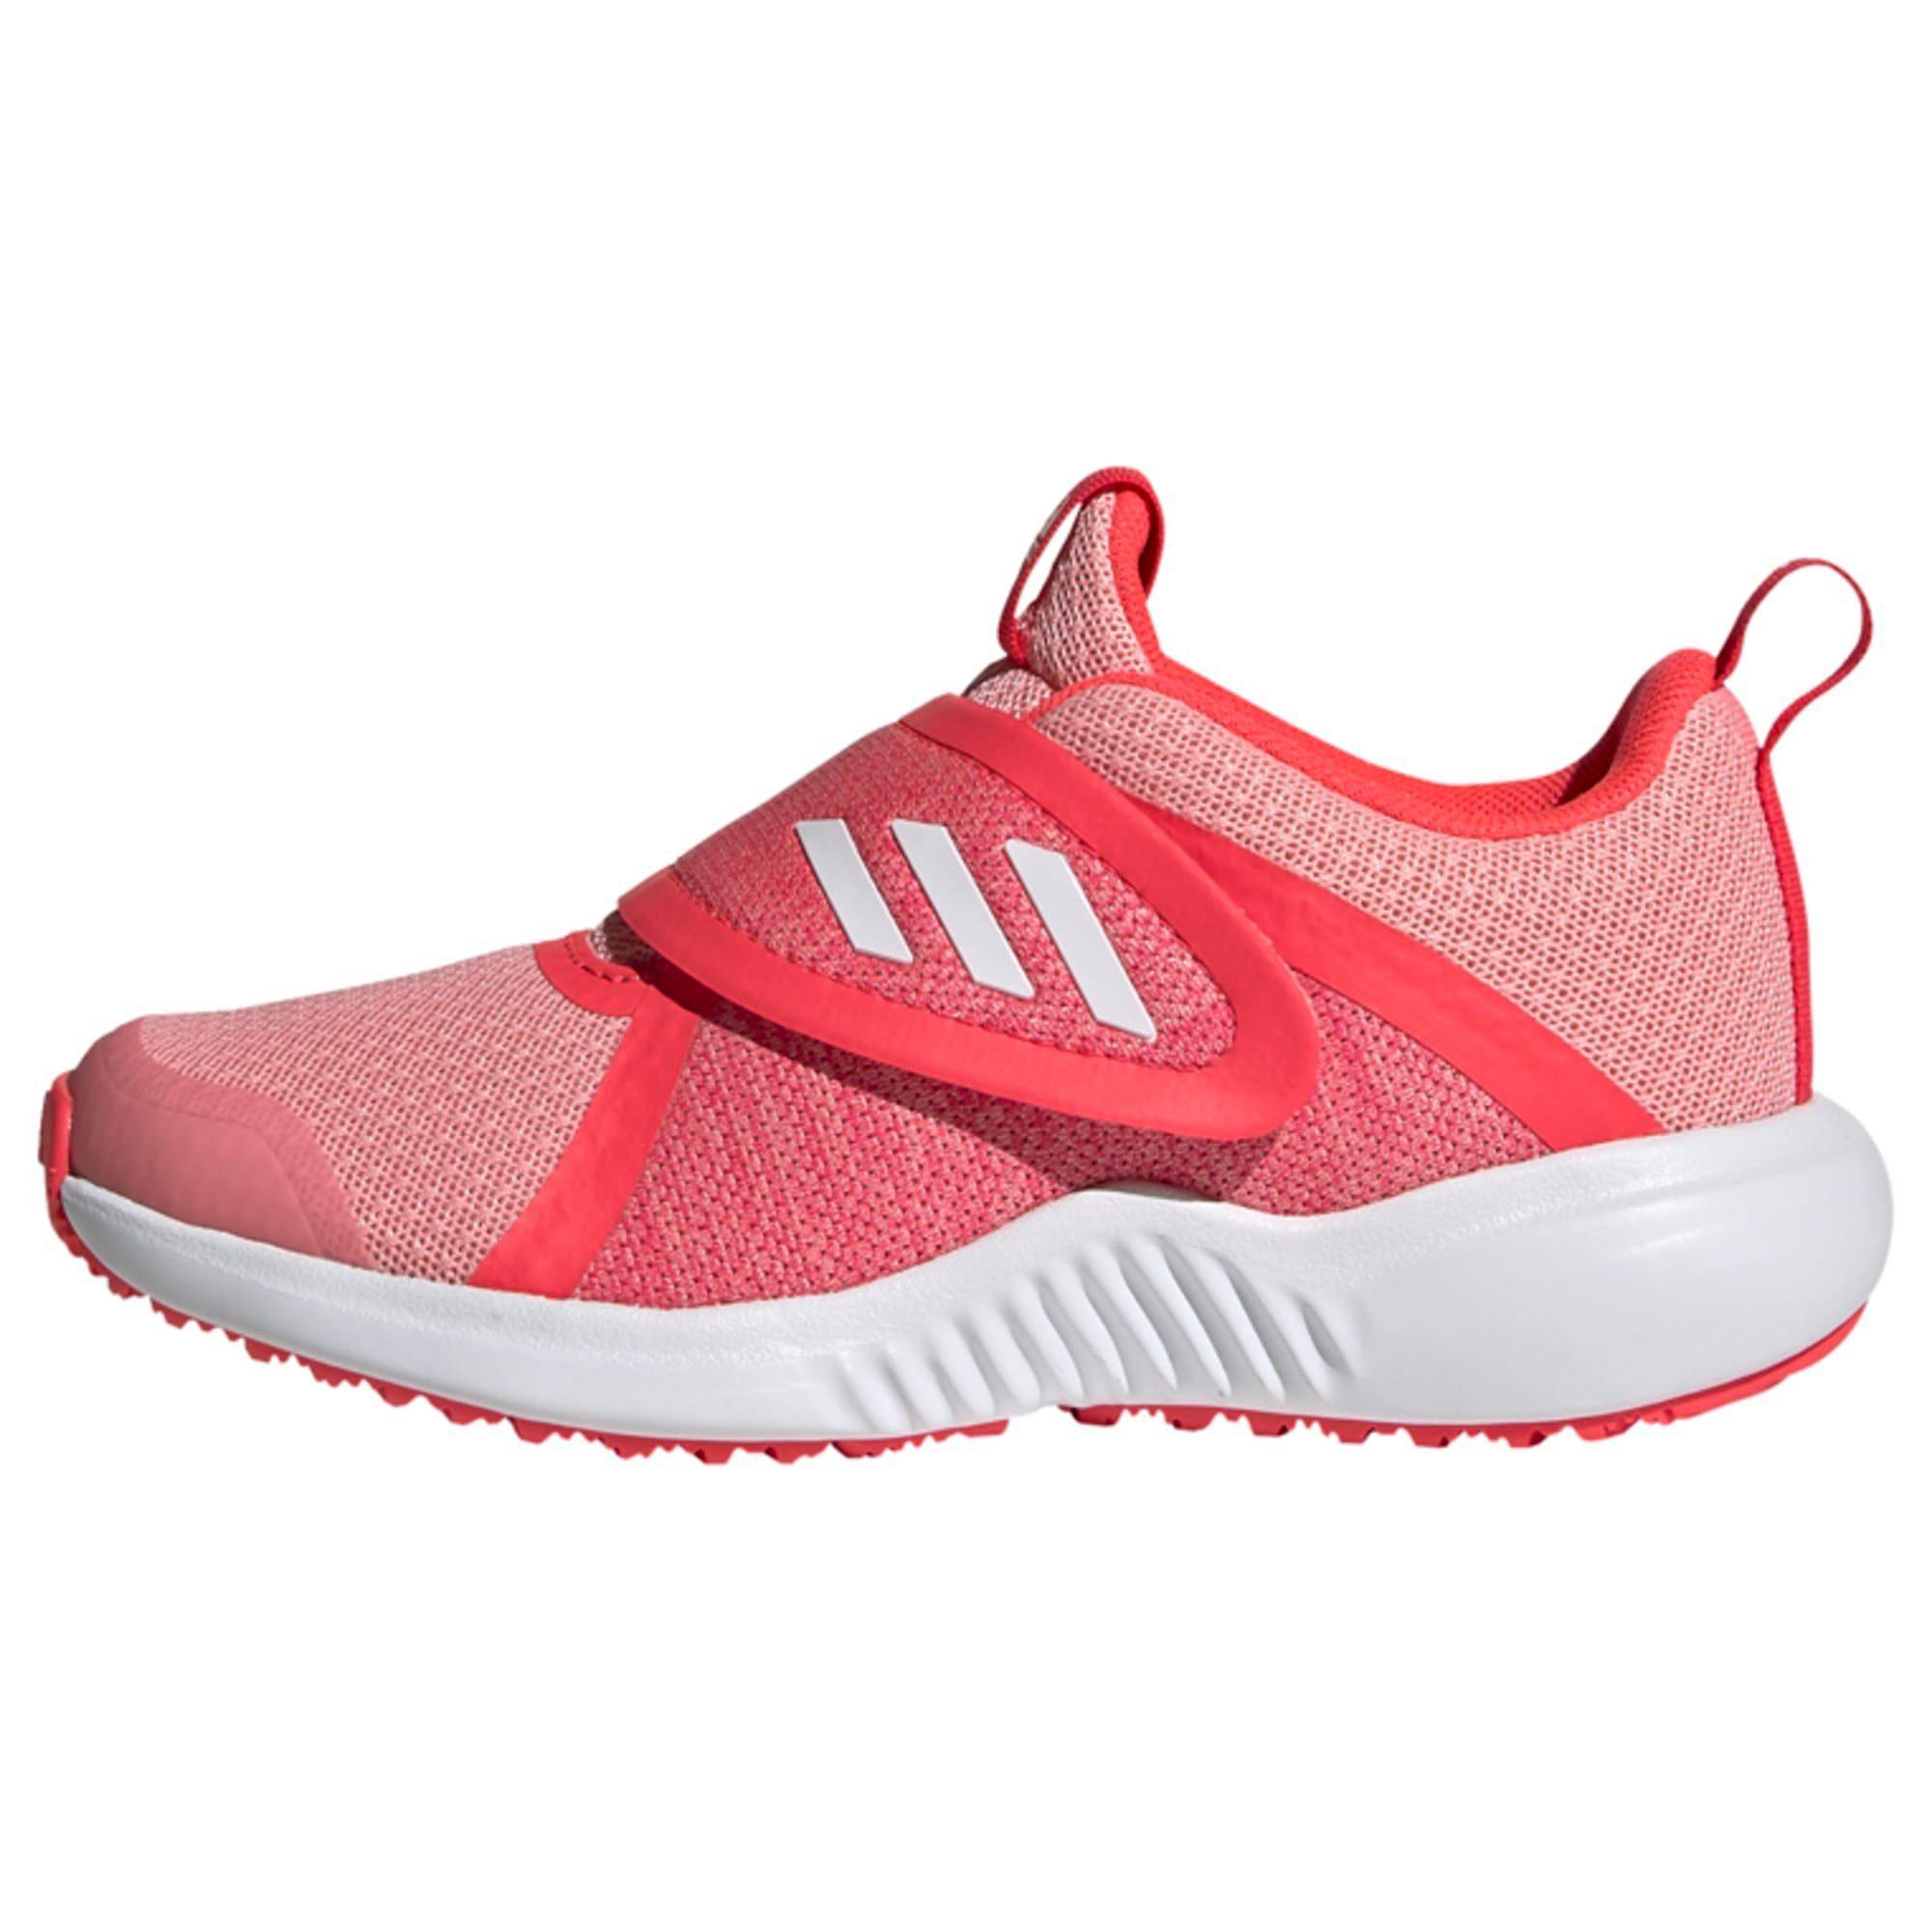 Adidas Performance X Schuh« Kinder Forta »fortarun Laufschuh